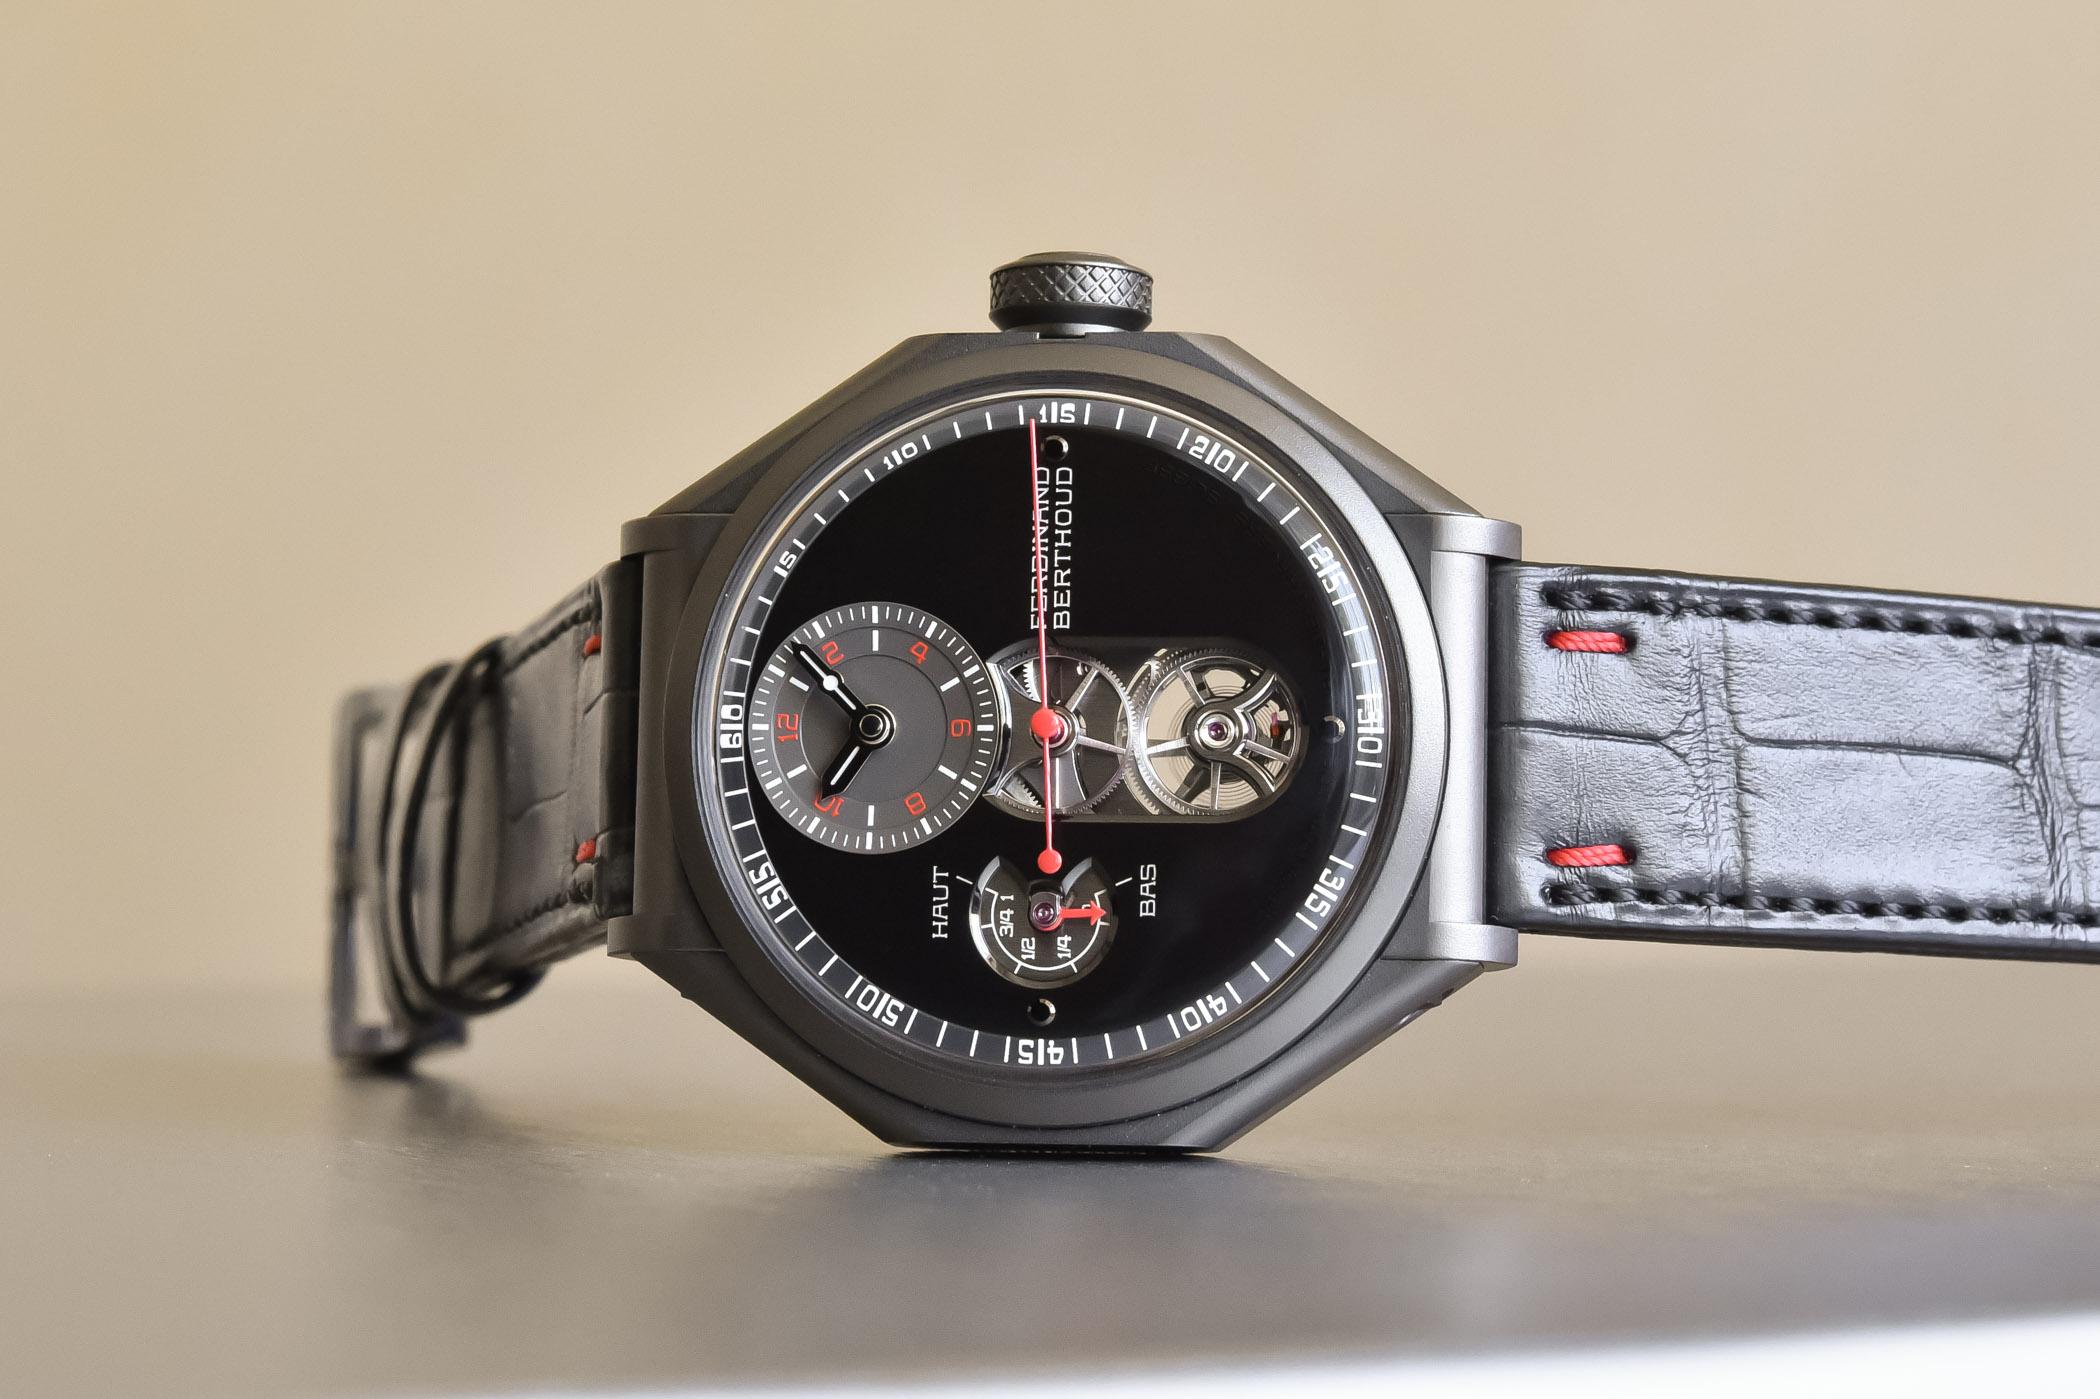 Ferdinand Berthoud Chronometre FB1.6-3 Unique Piece Art in Time